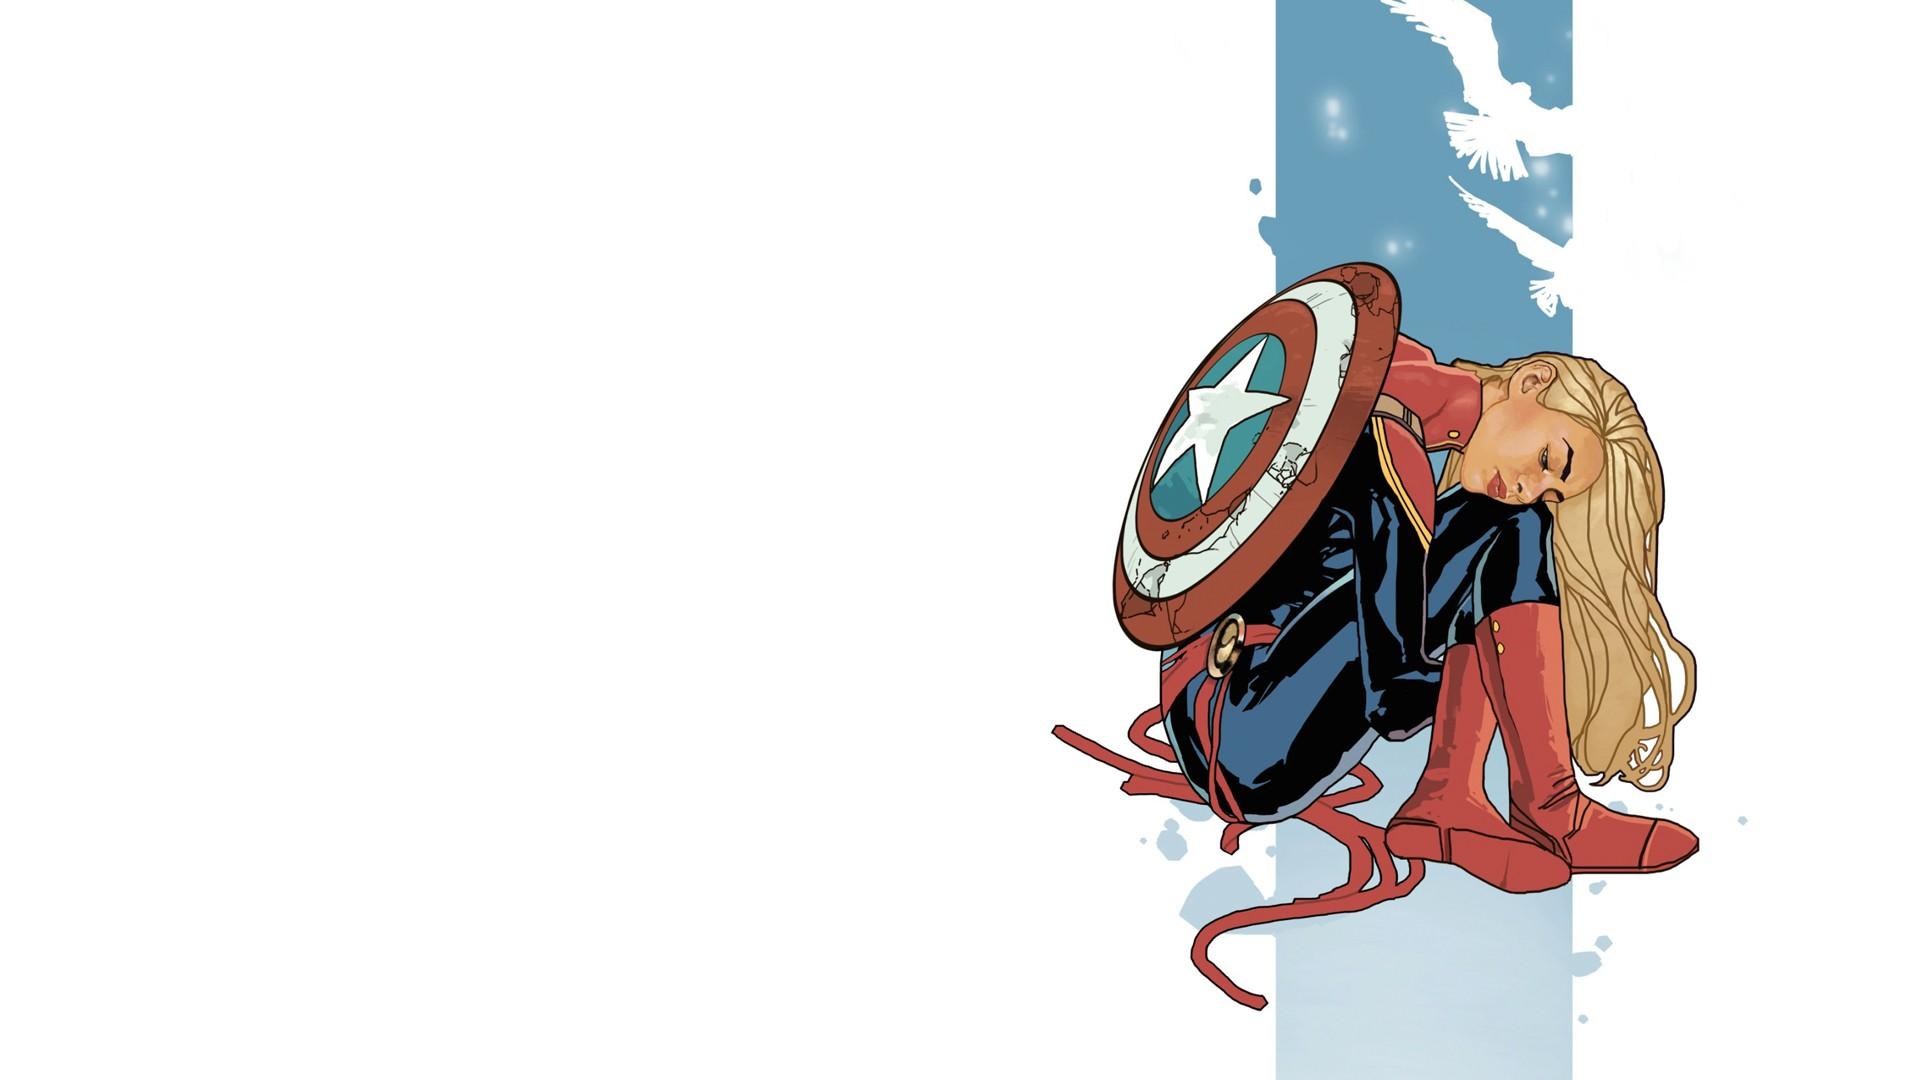 General 1920x1080 Captain Marvel superhero Marvel Comics